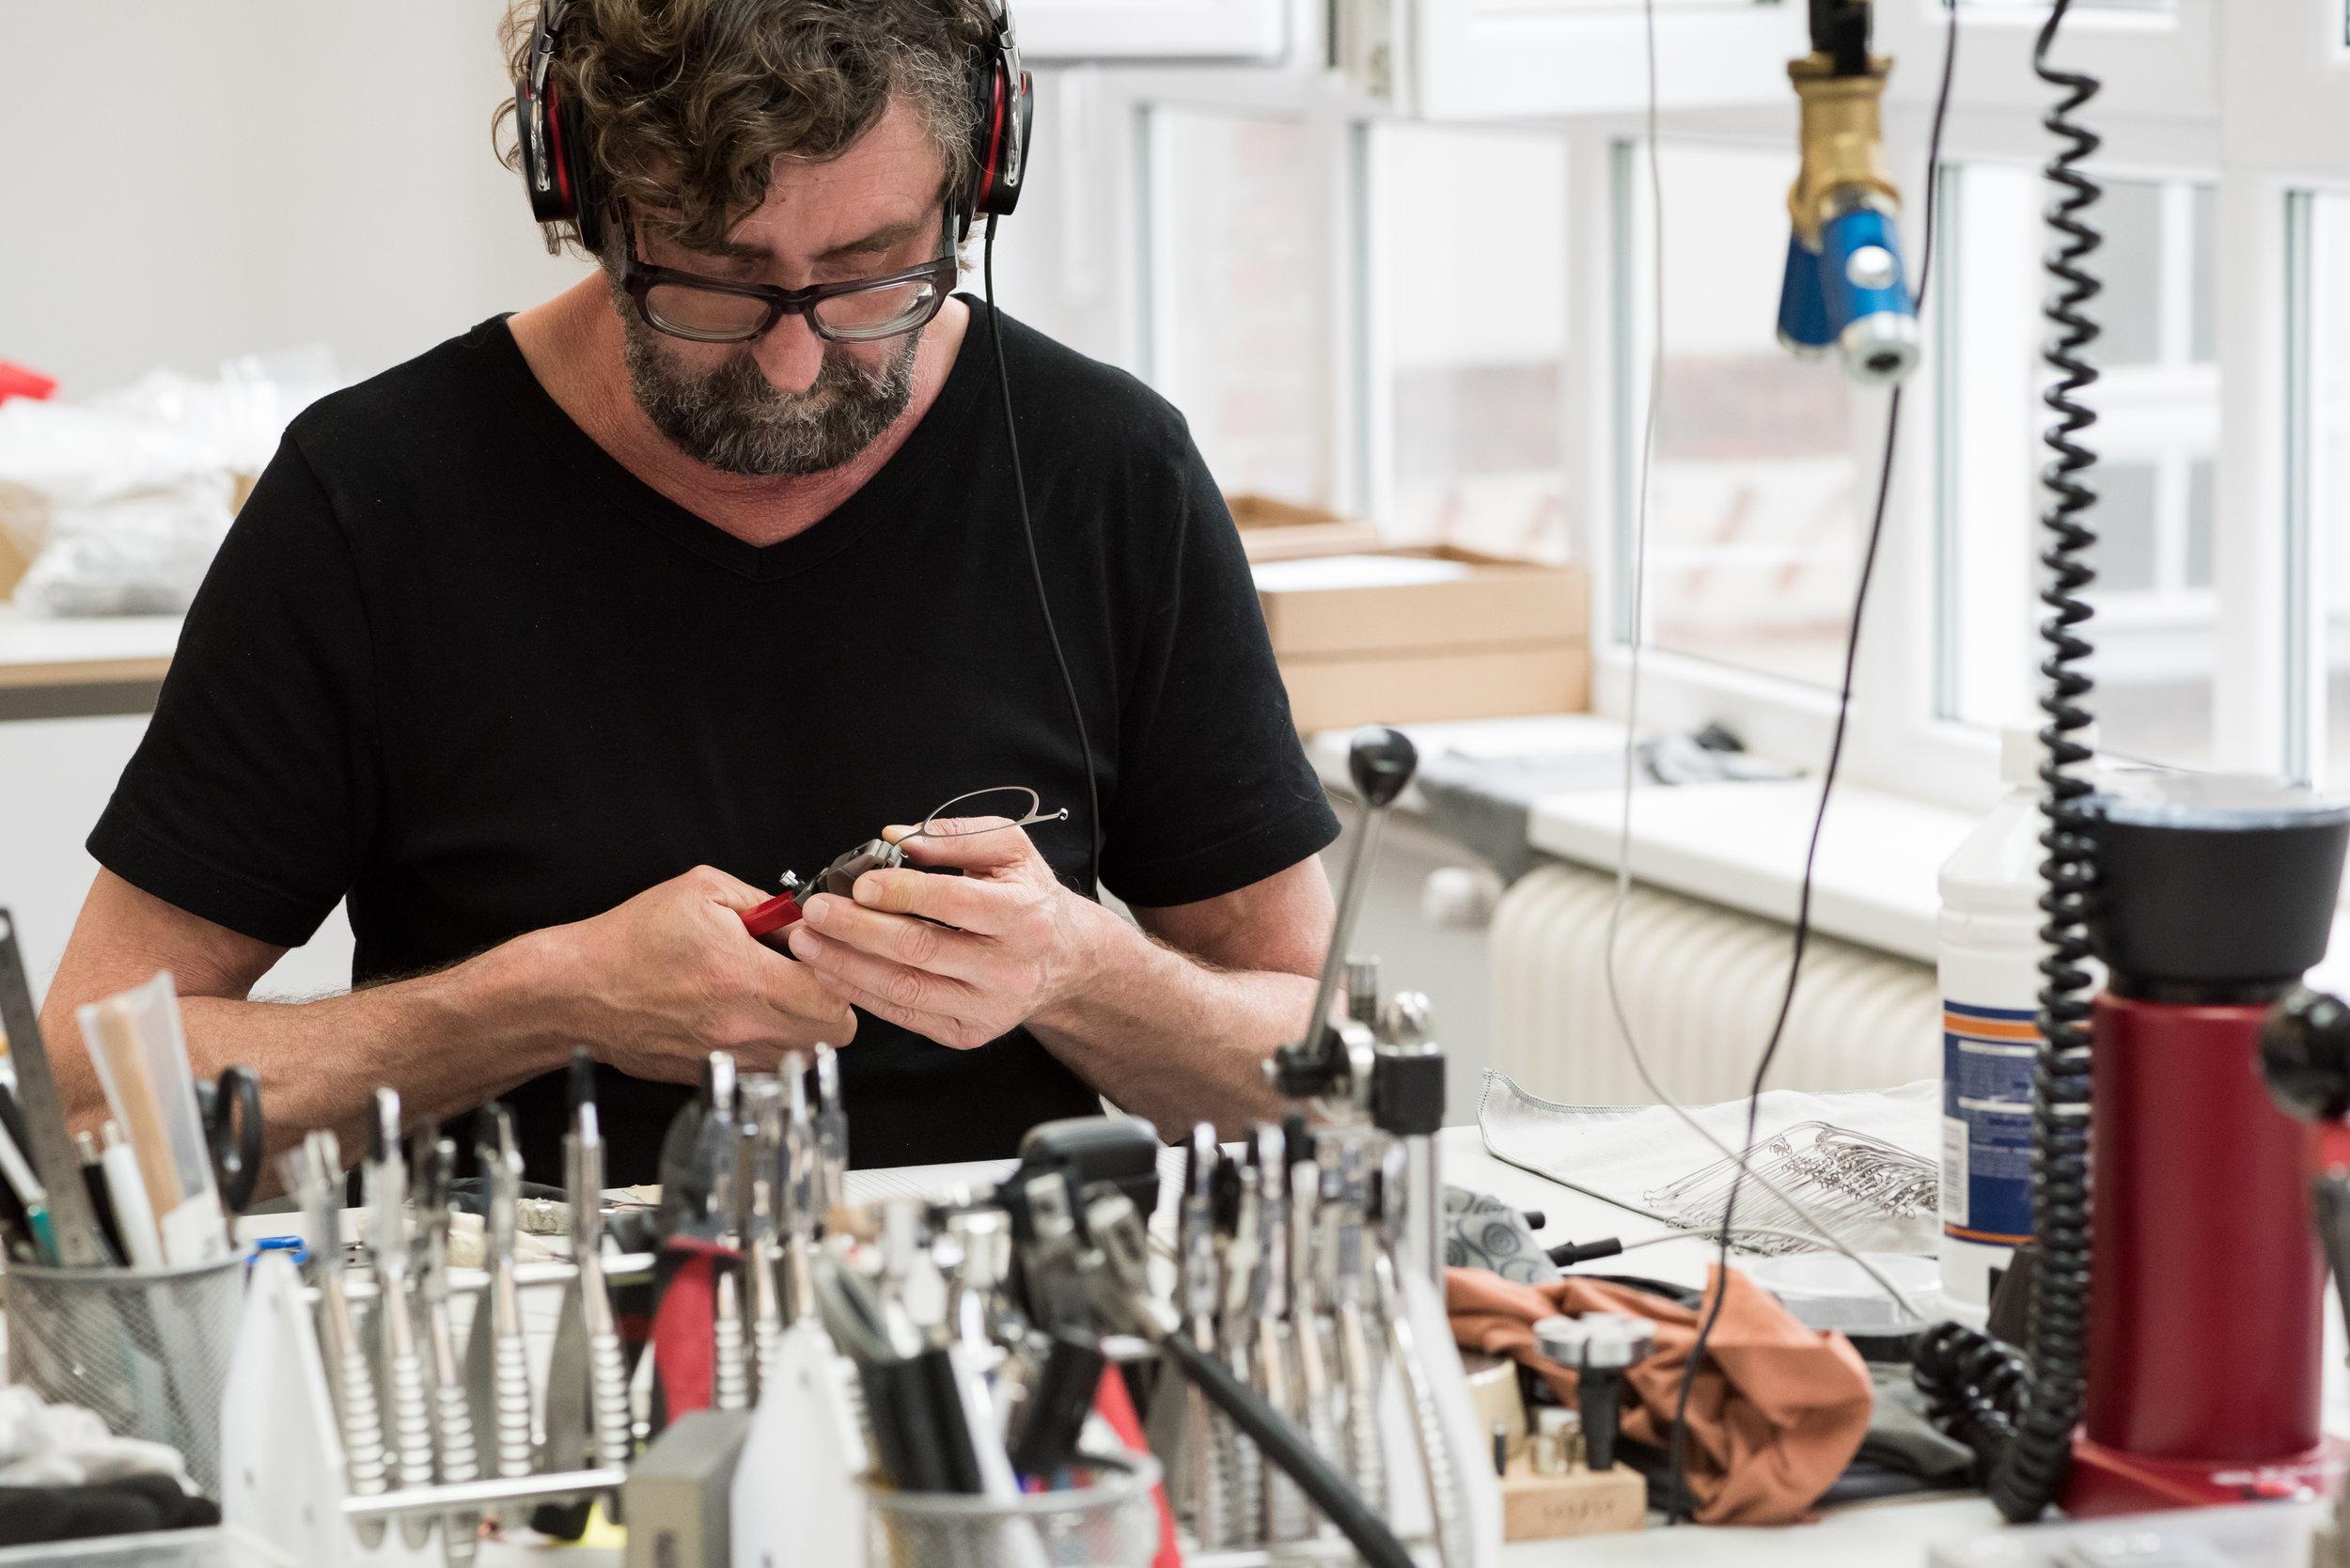 Haffmans Neumeister Eyewear Production Manufactory-0051.jpg